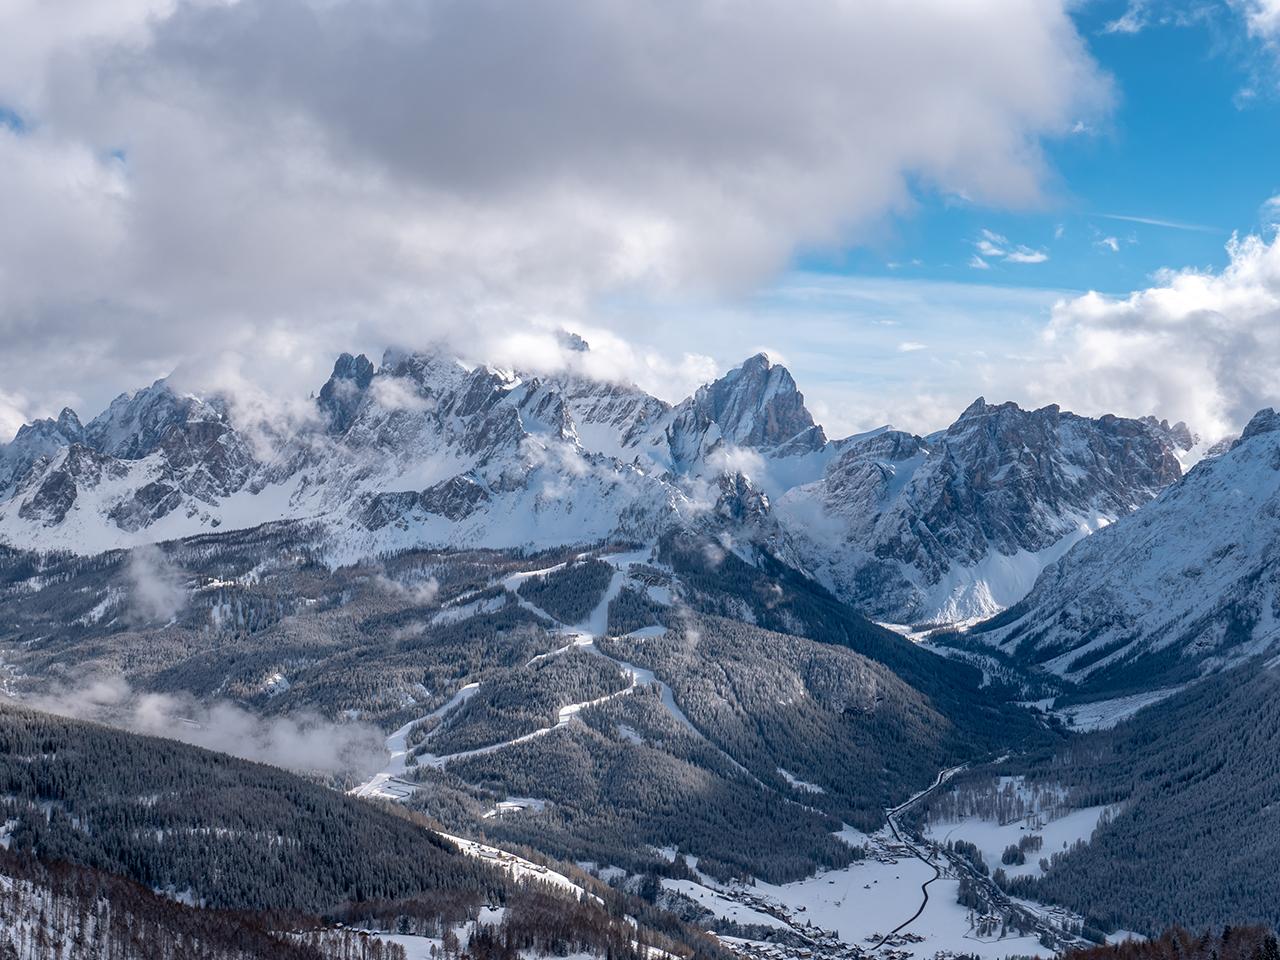 Drei Zinnen Dolomiten - Rene Sebastian